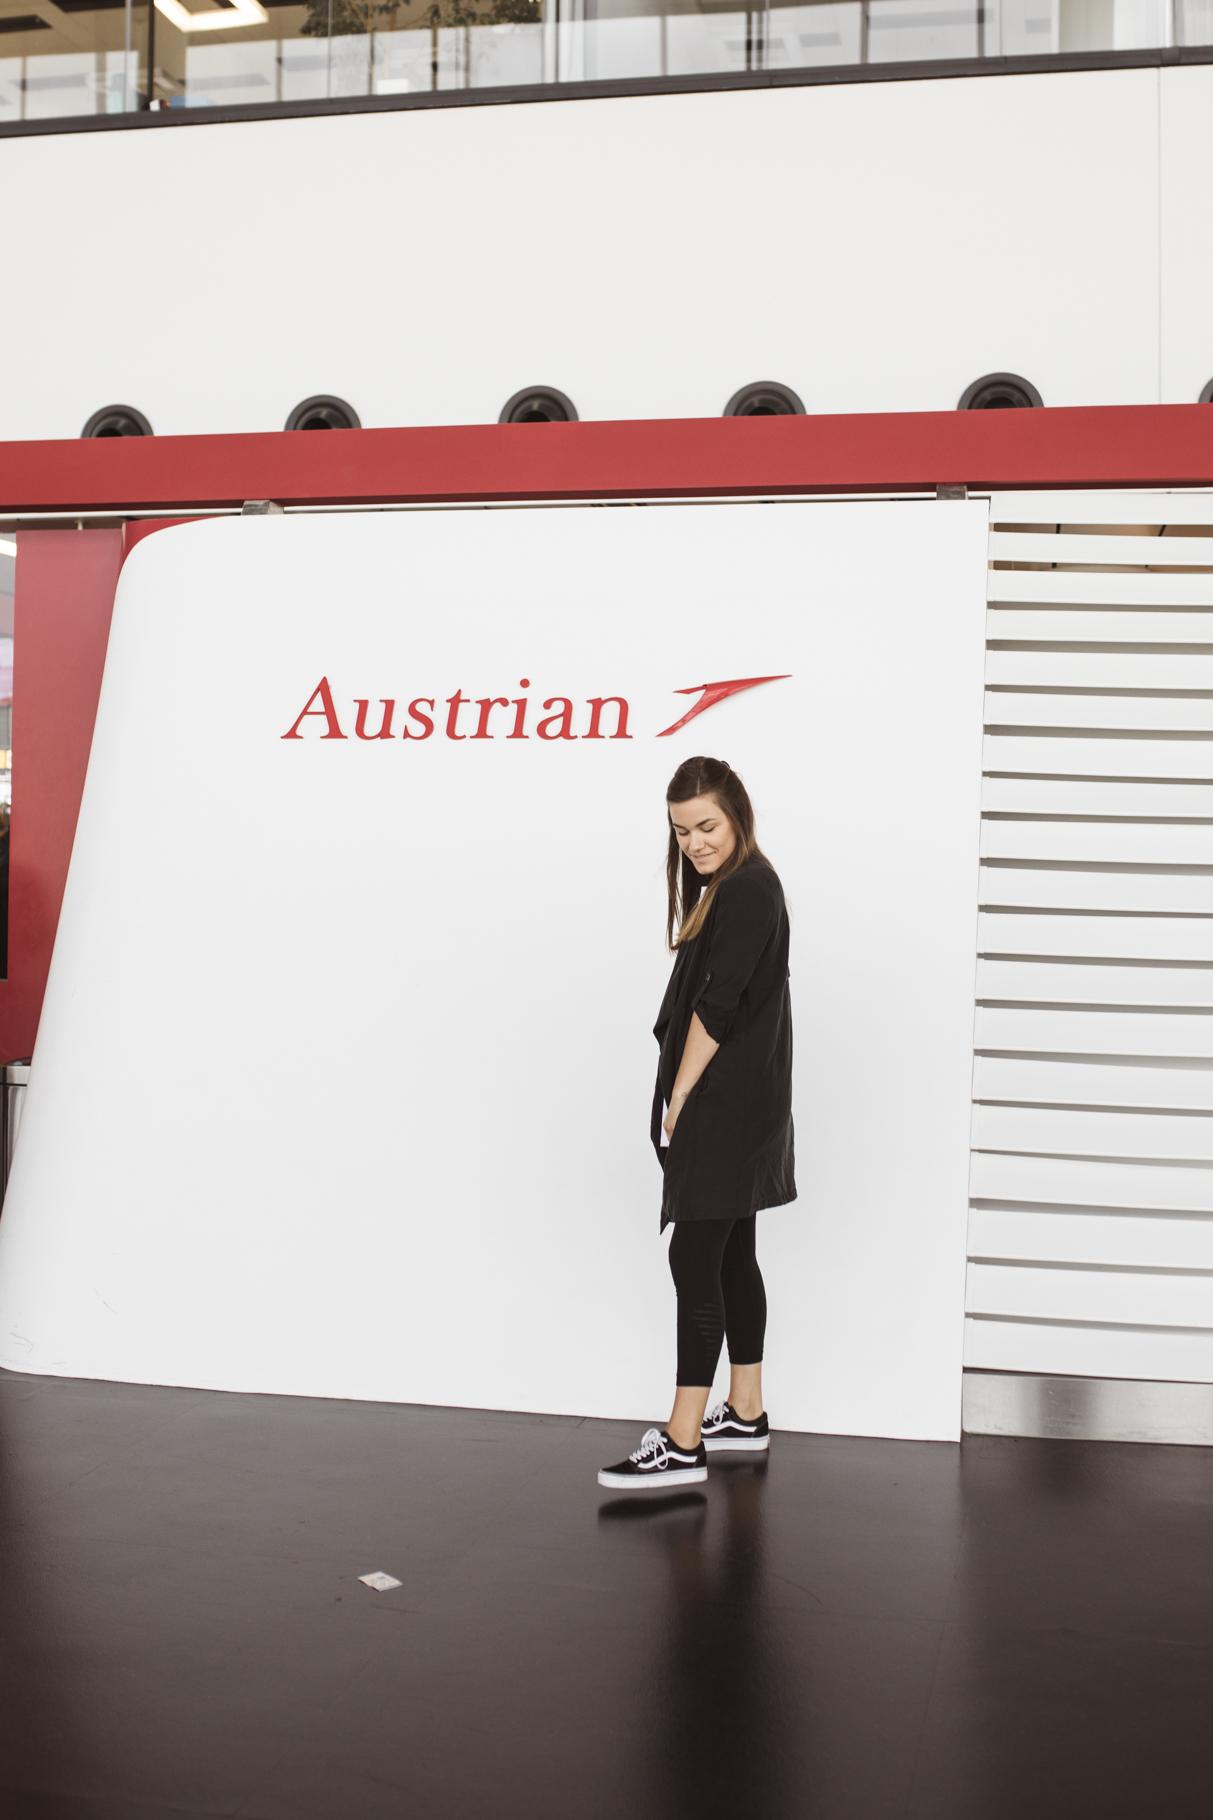 annalaurakummer, new york, local guide, austrian airlines, sta travel